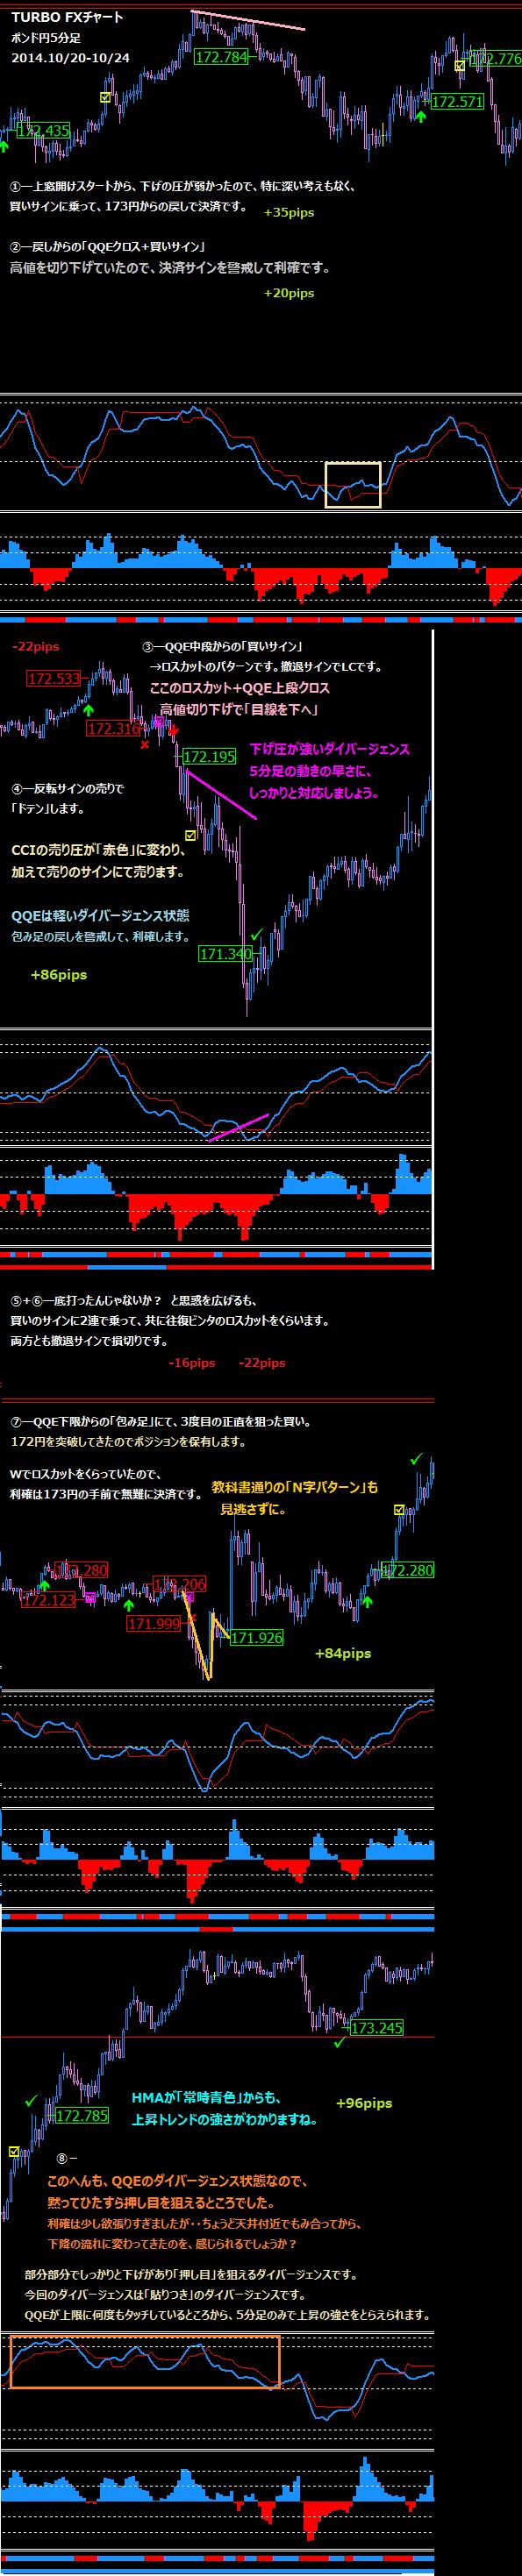 TURBO FX(ターボFX)口コミ評価ブログ